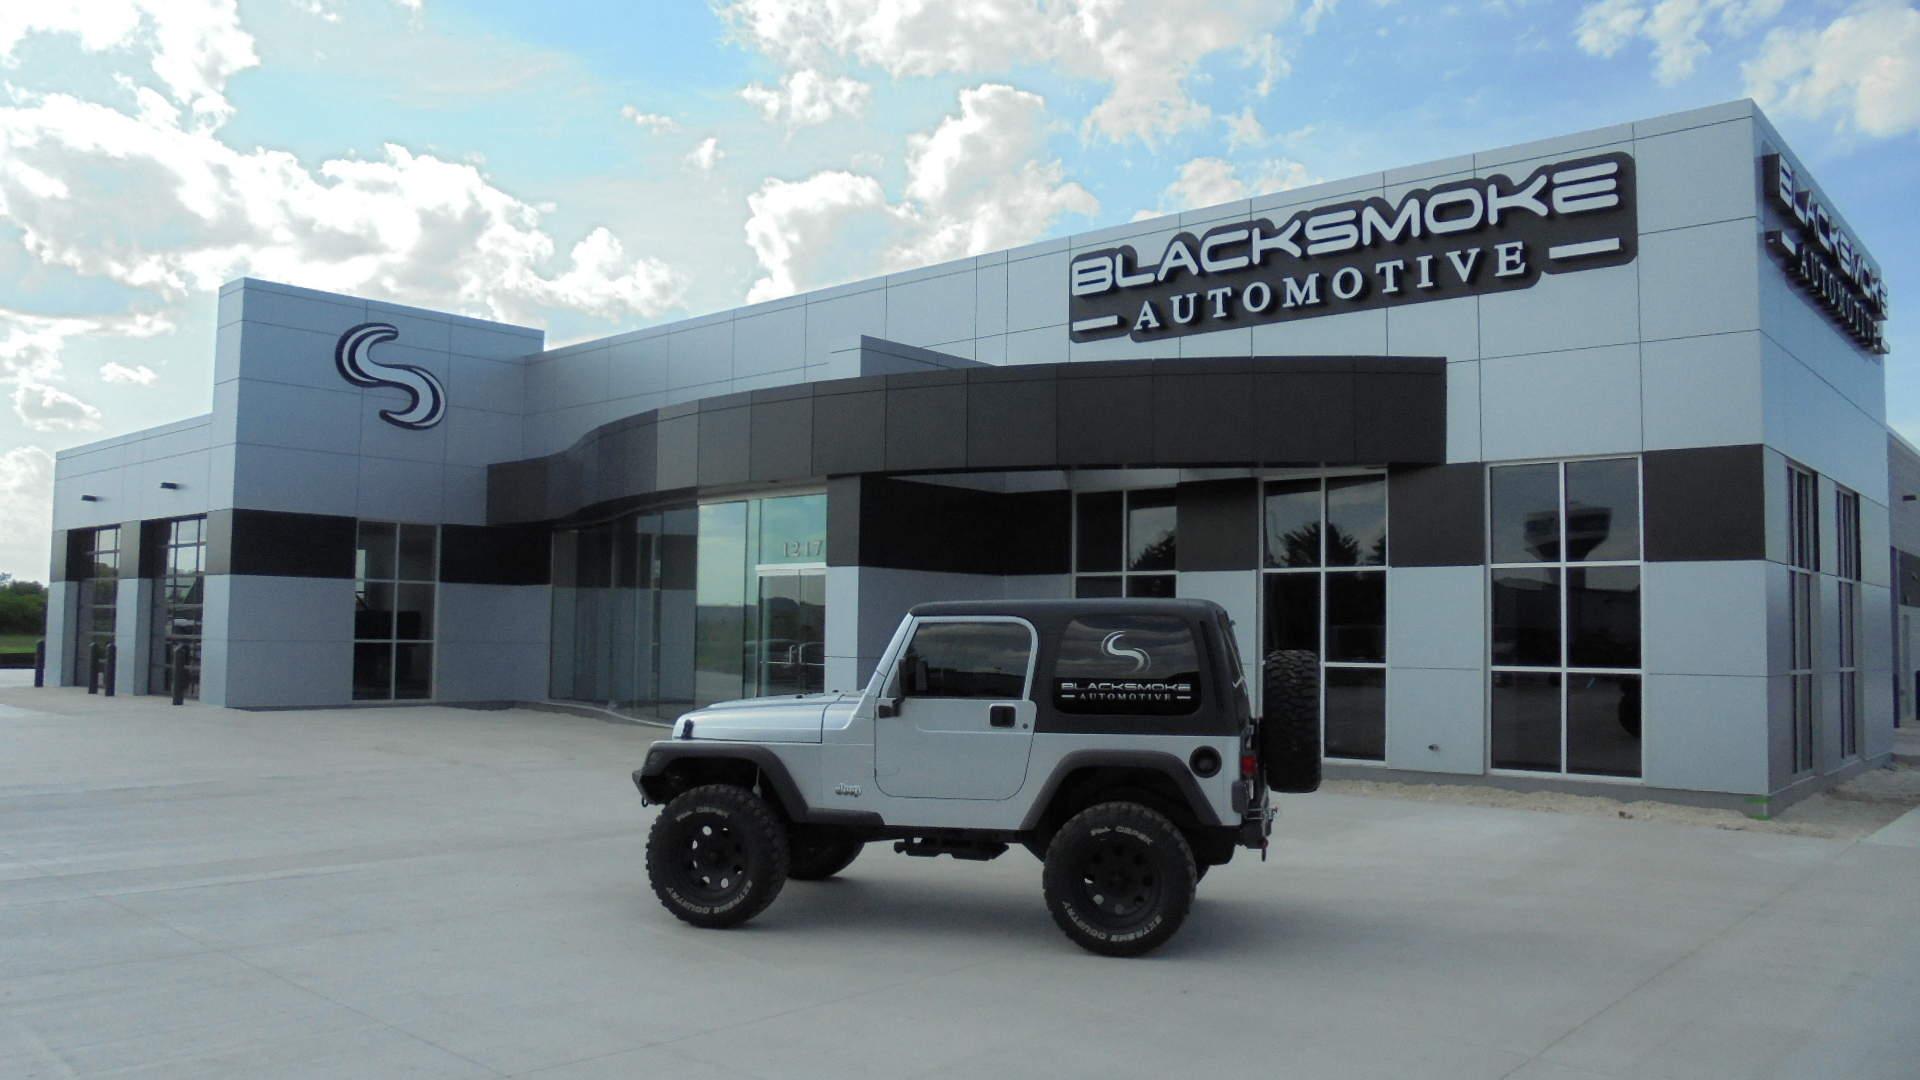 Blacksmoke Automotive image 1